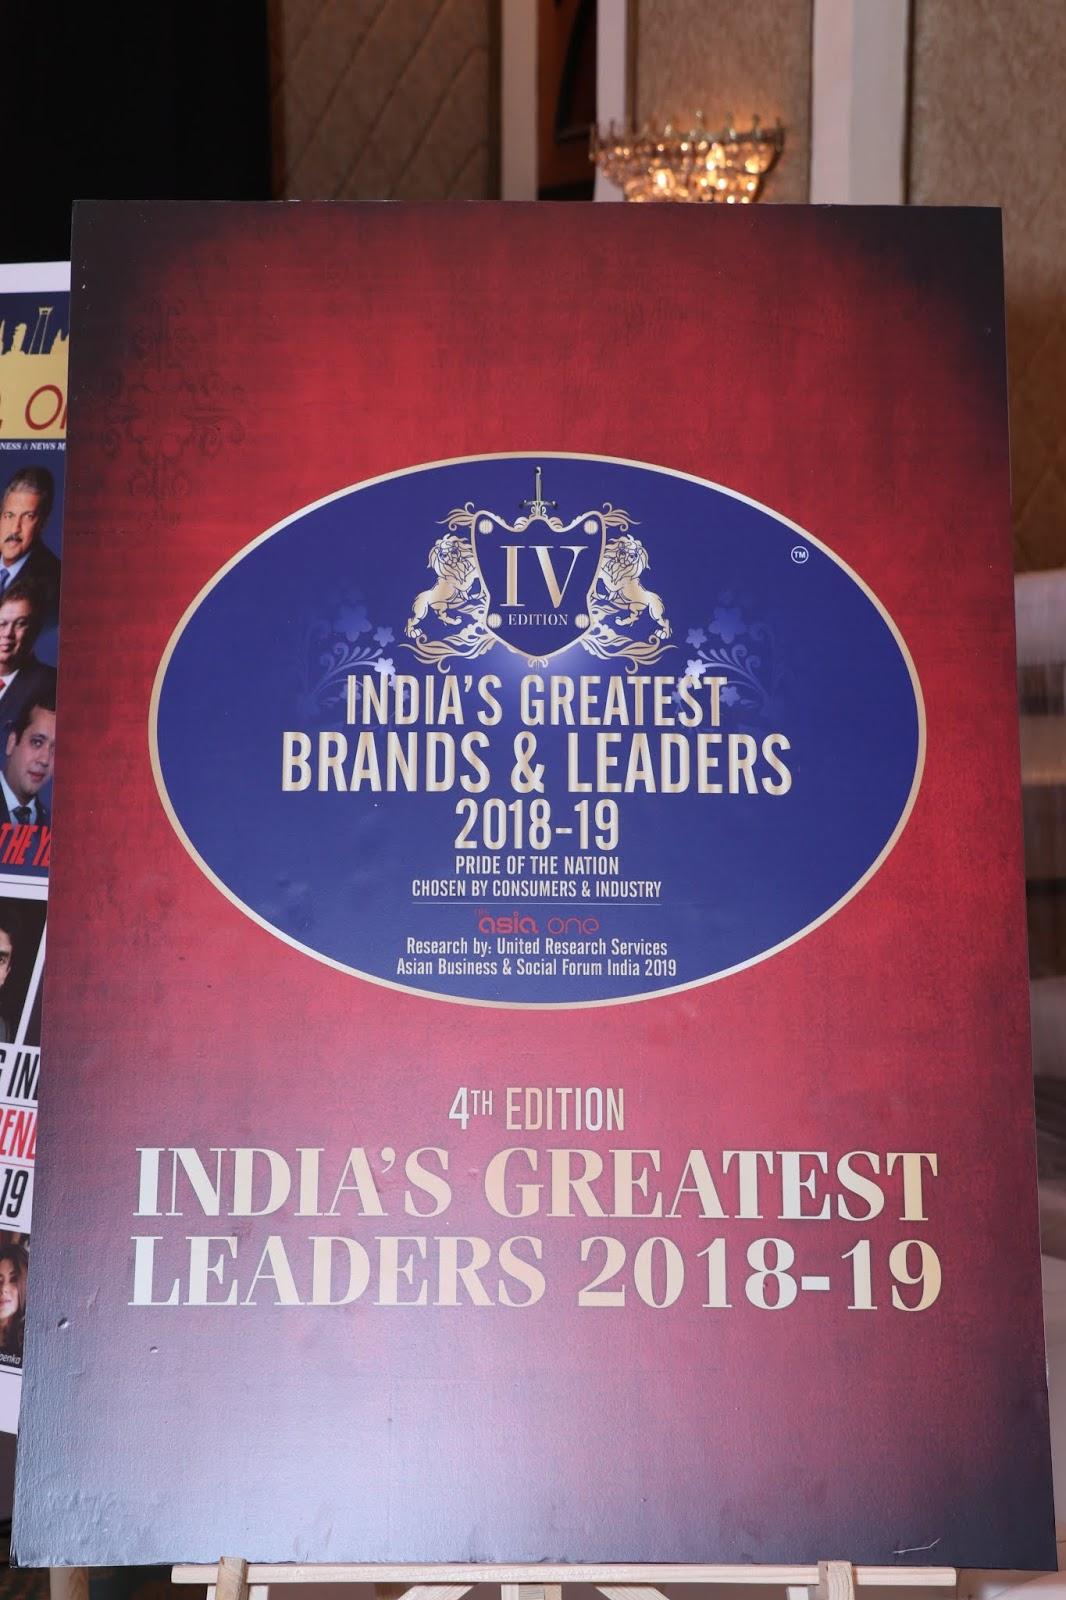 HoneyyGroup & Shri. Obulreddy Reddy Mukka Garu Achieved India's Greatest Brands & Leaders Awards 2019